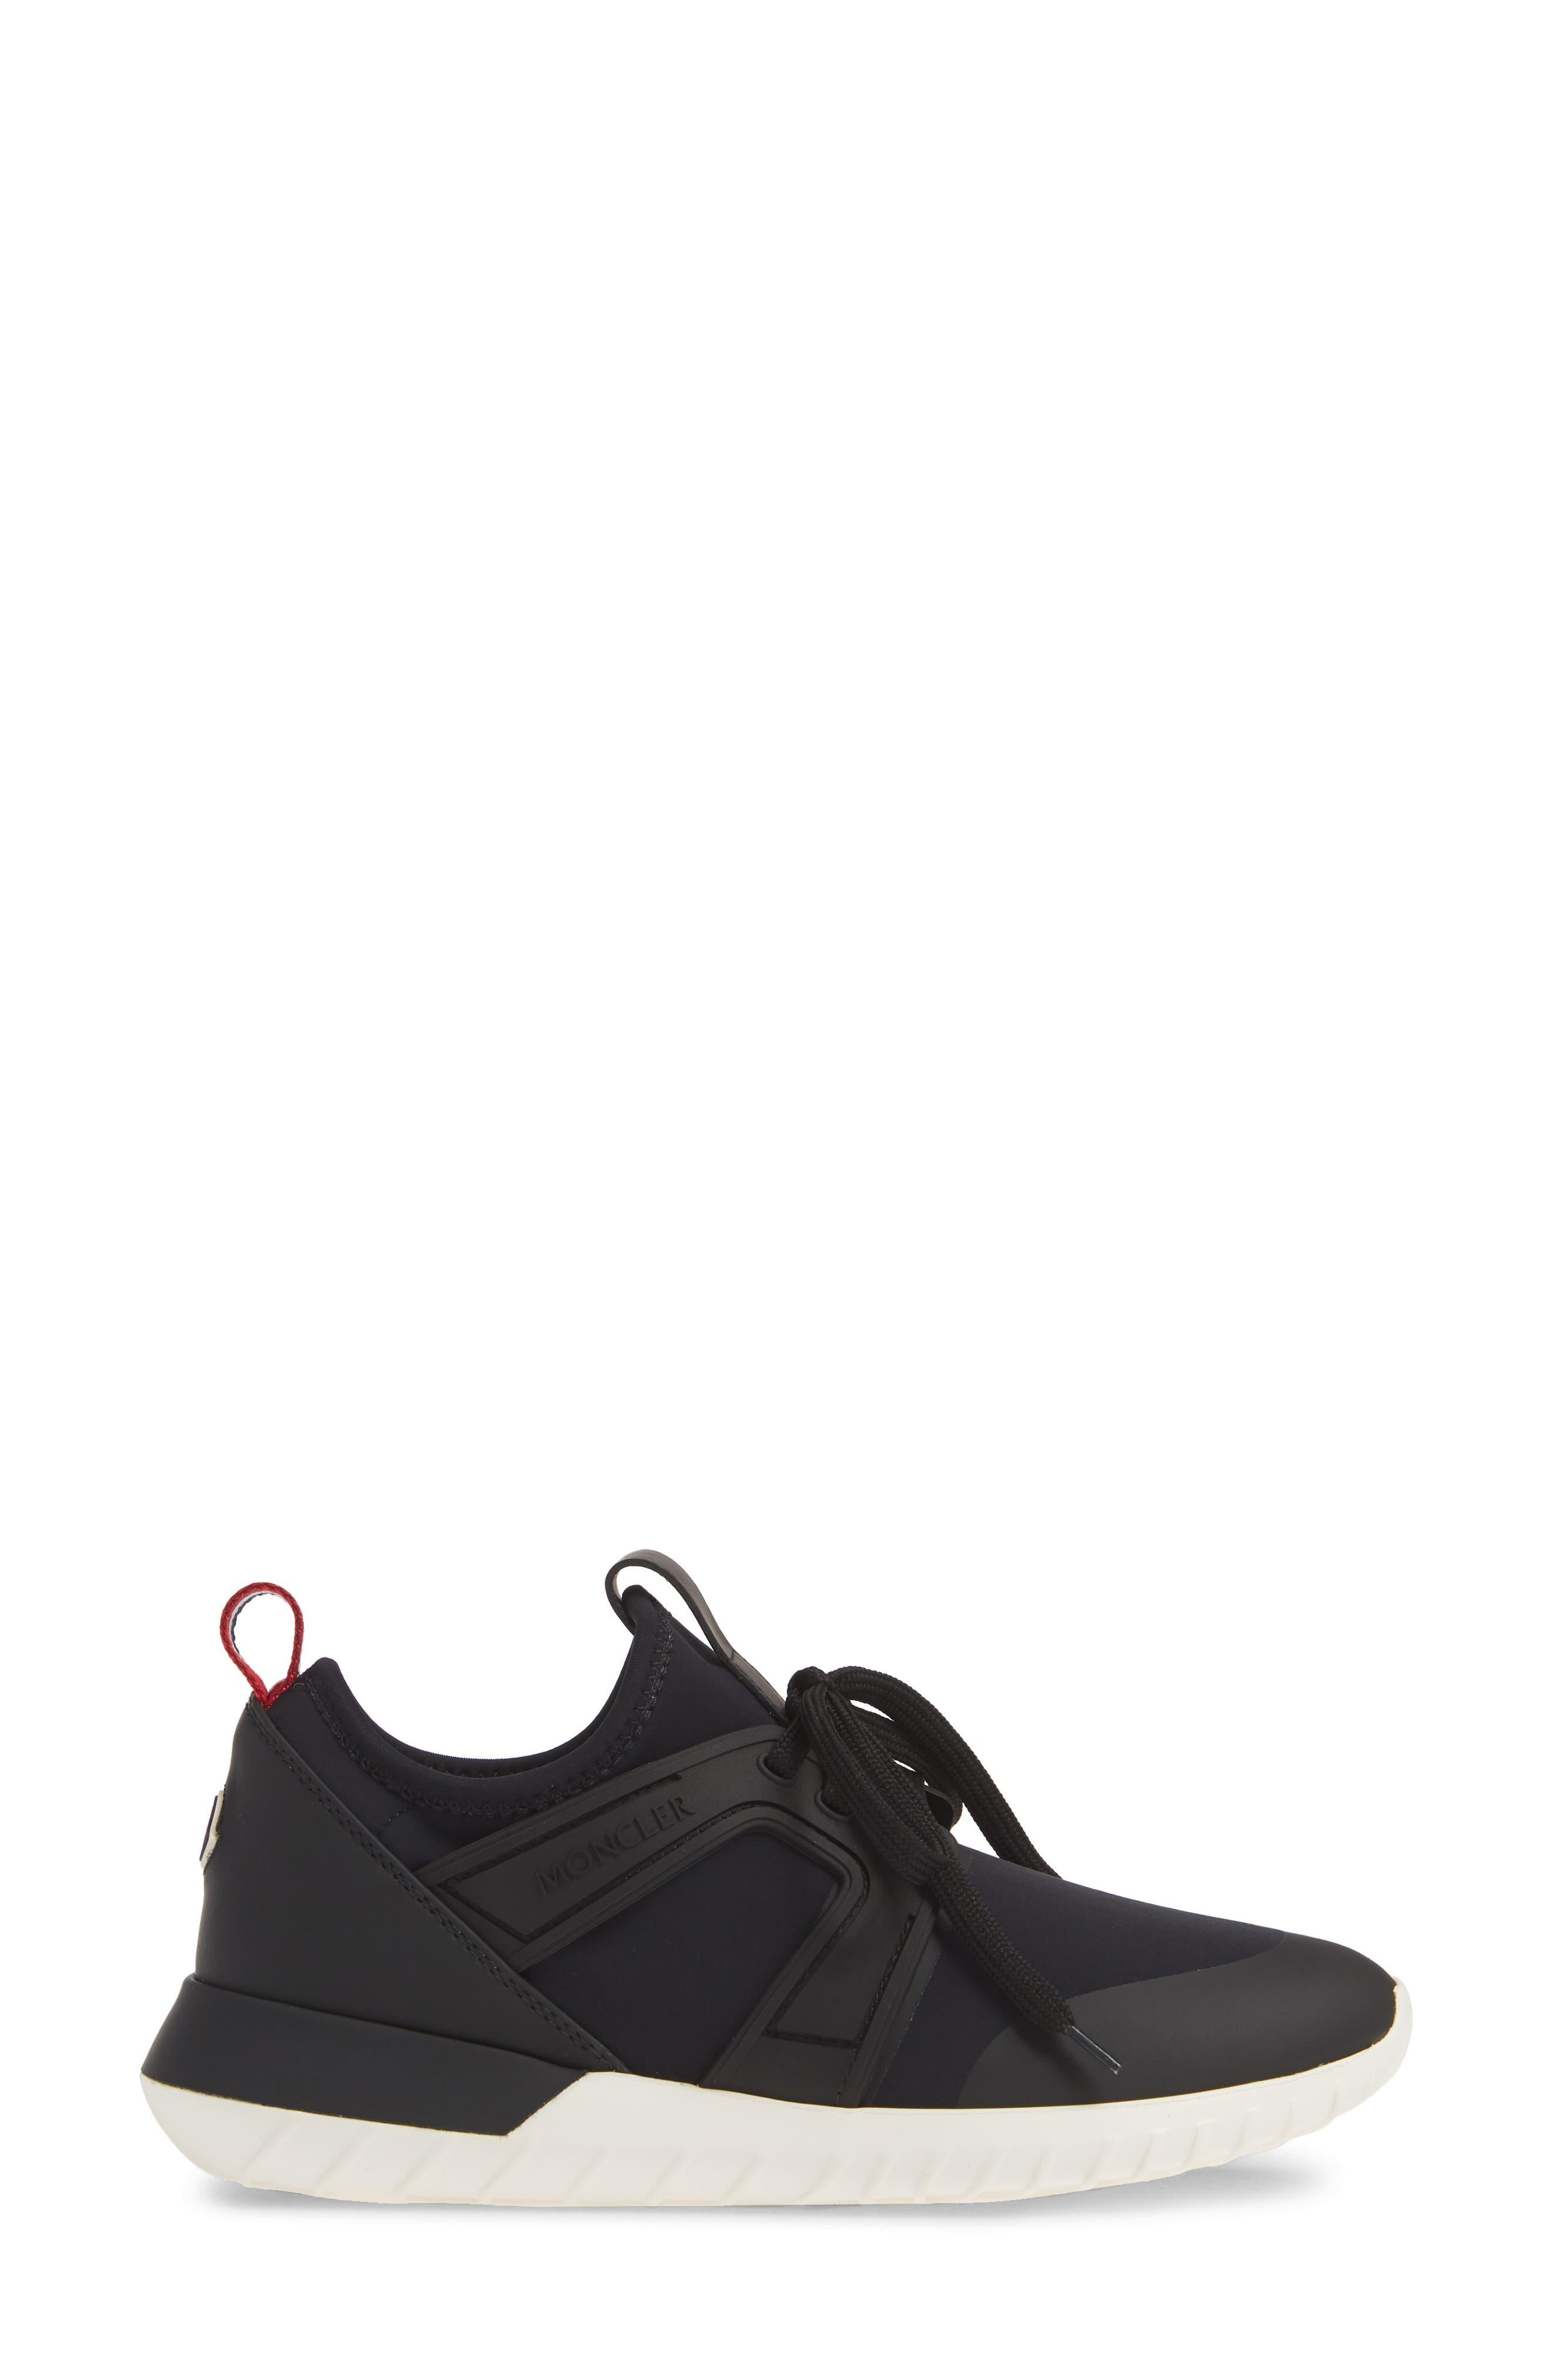 MONCLER, Meline Scarpa Sneaker, Alternate thumbnail 3, color, BLACK